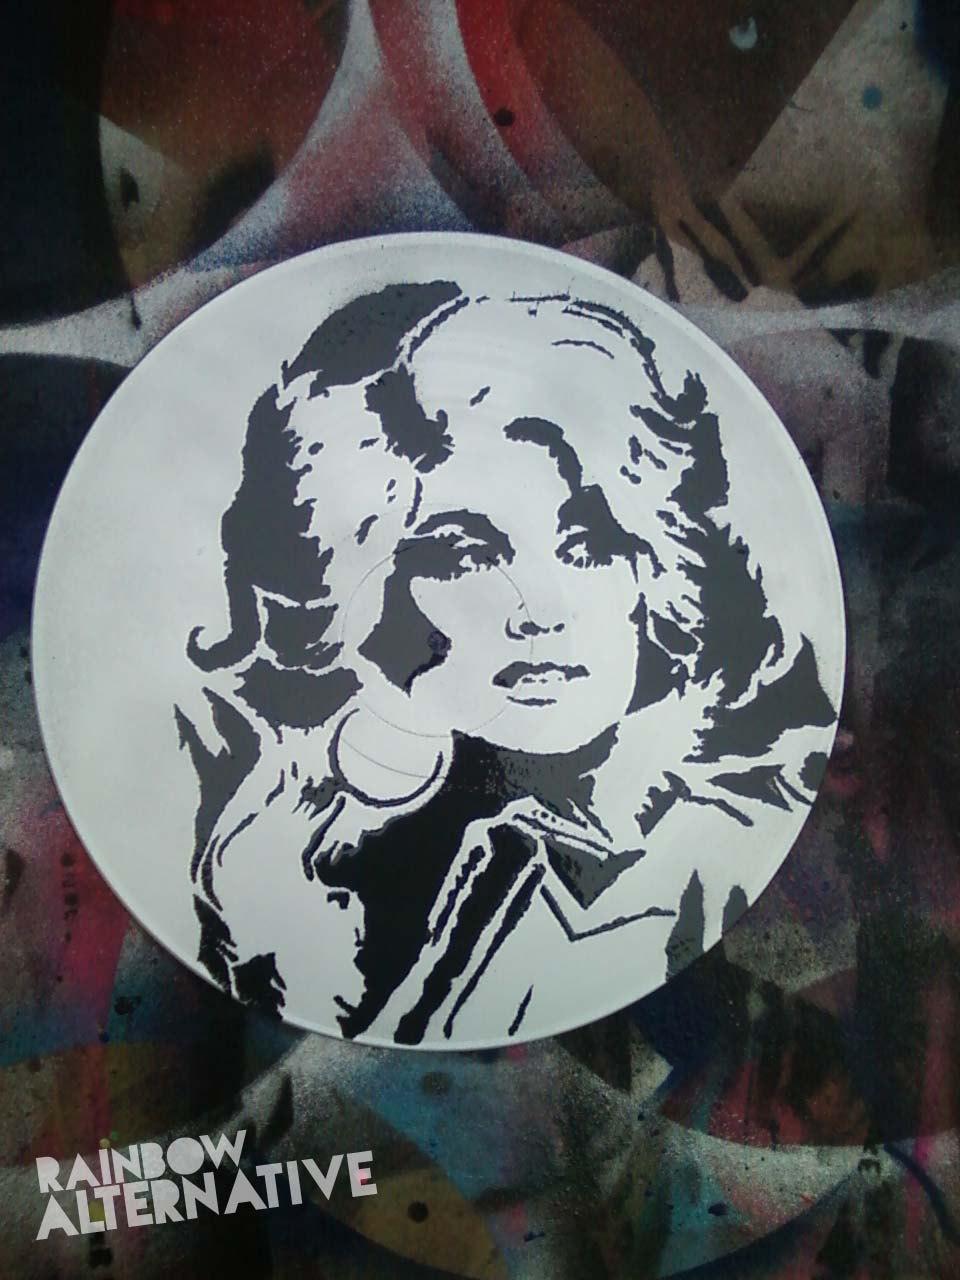 Dolly Parton Country Music Pop Art Vinyl By Rainbowalternative